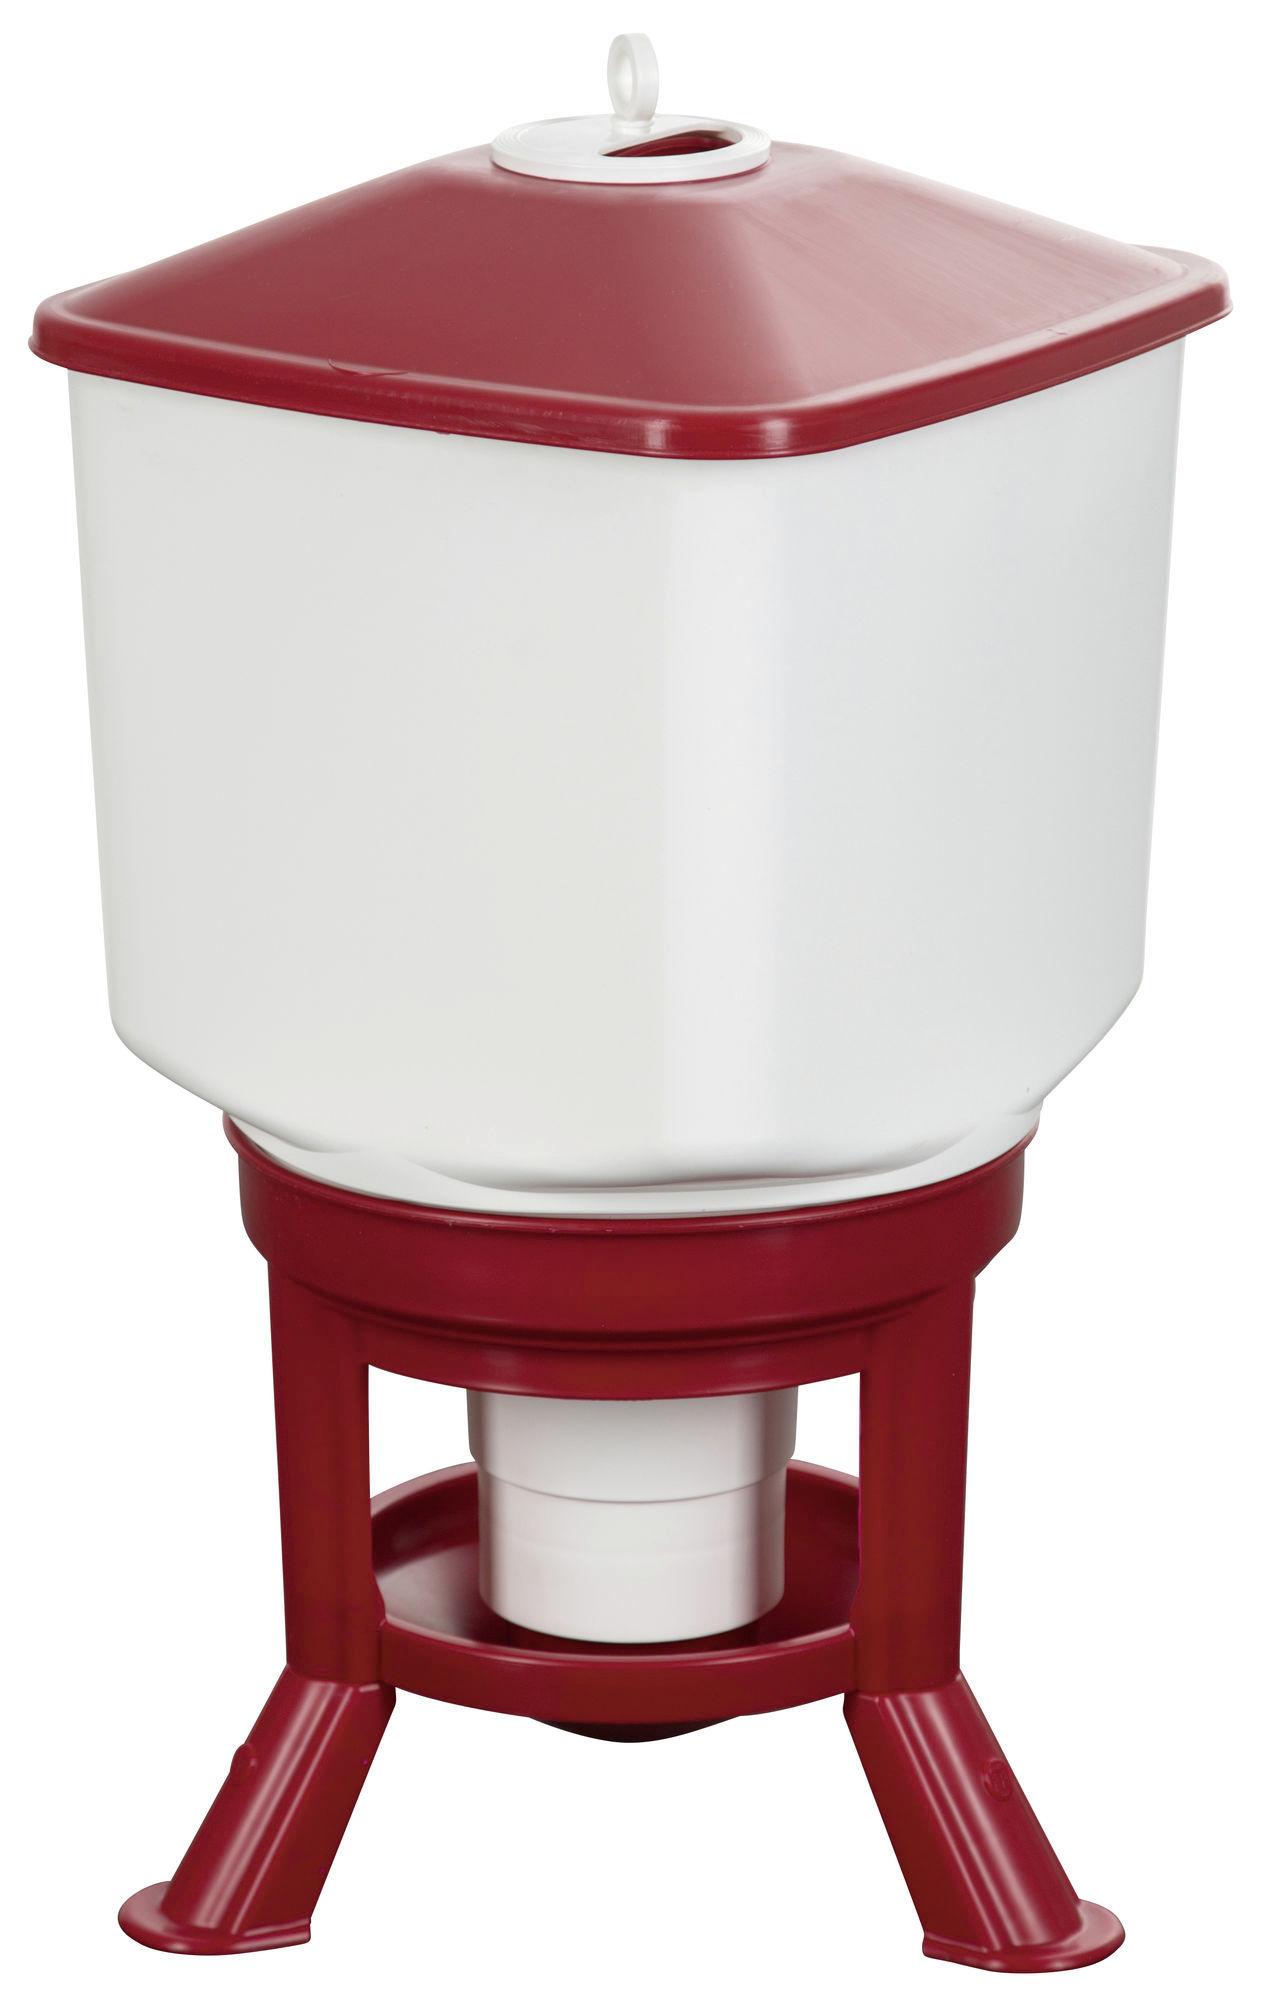 Adapatoare pentru pasari Kerbl Kubic - 40 litri